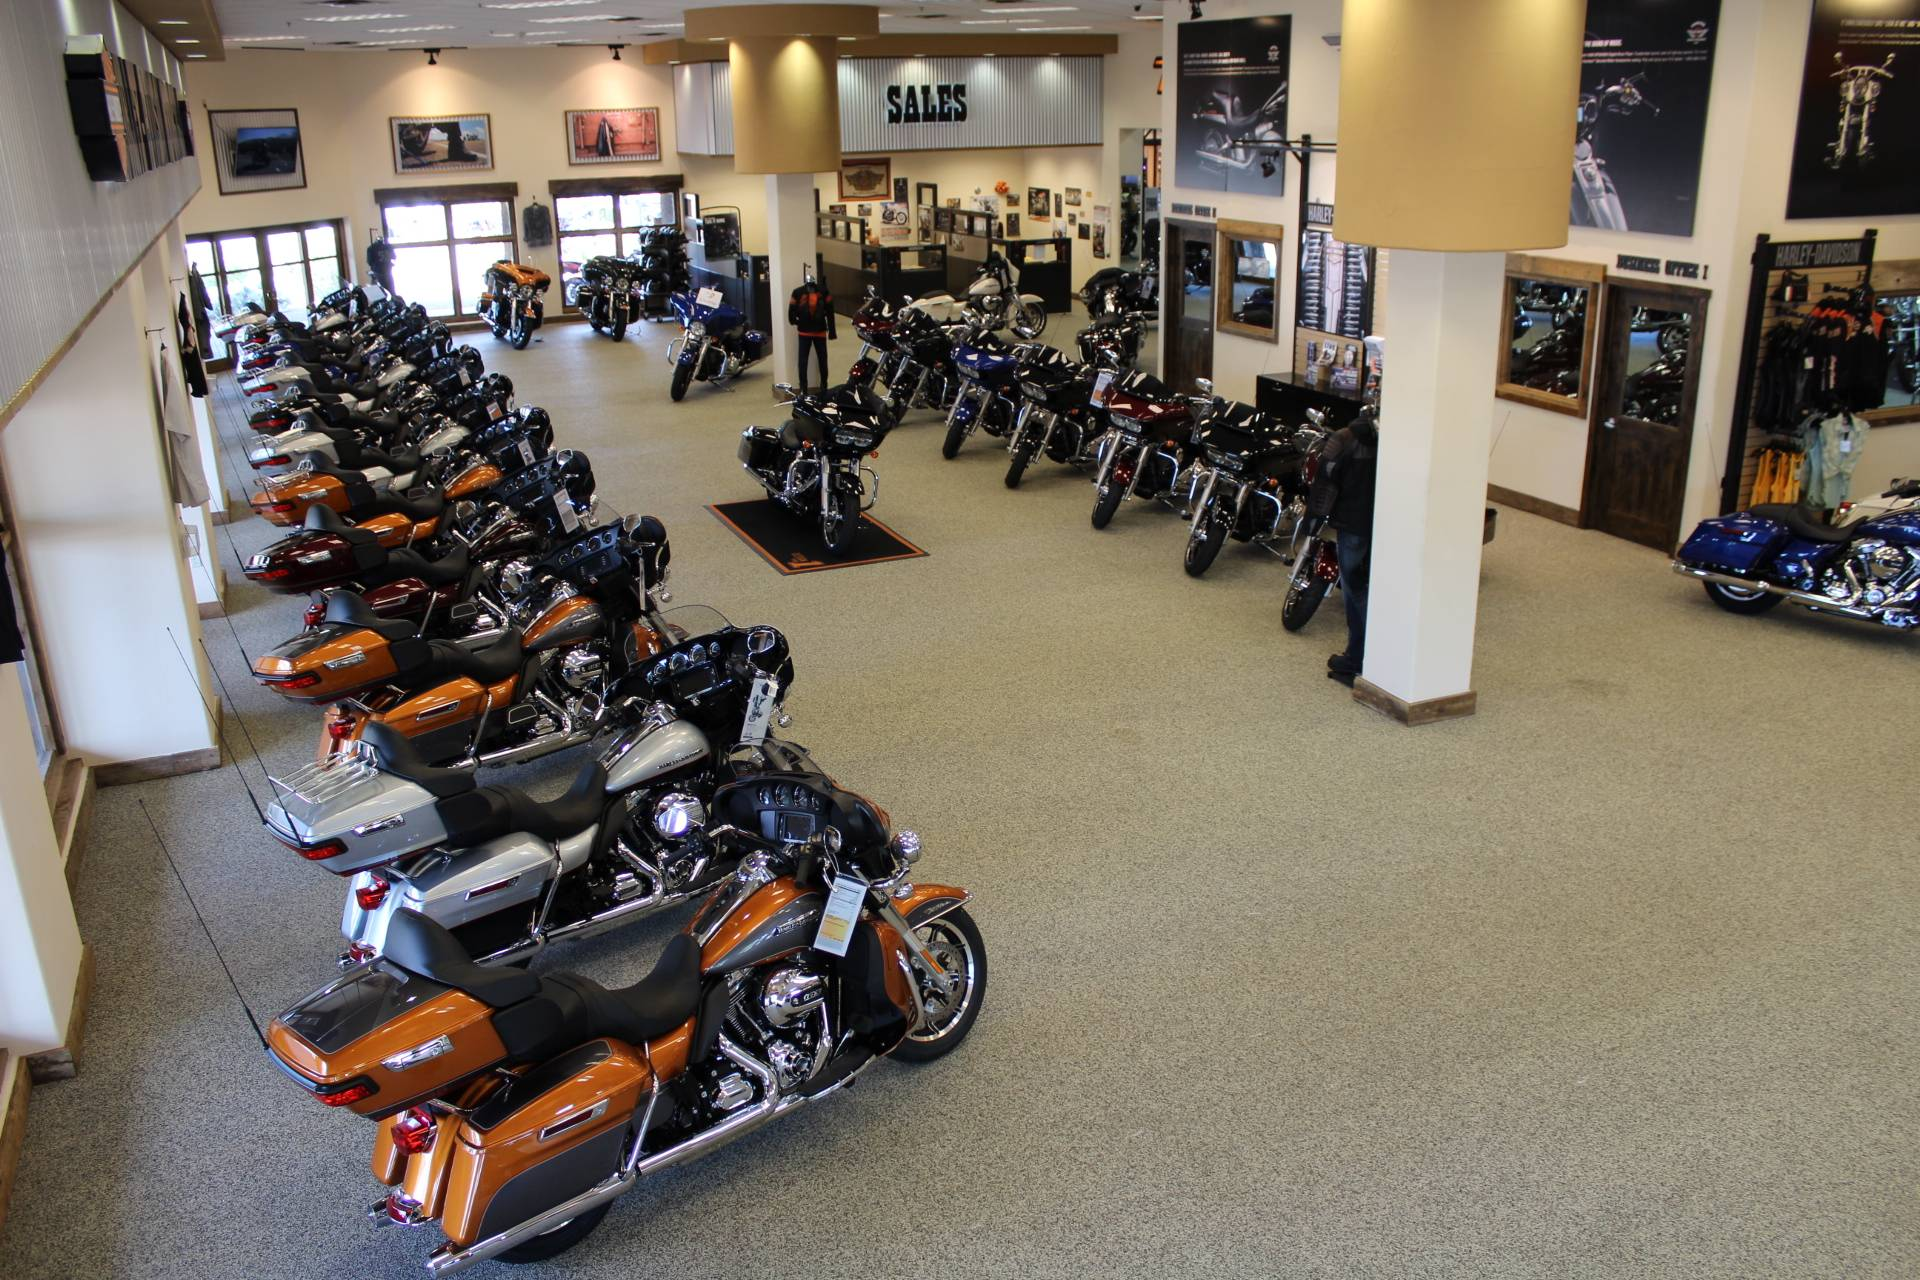 HarleyDavidson CVO Pro Street Breakout Motorcycles Apache - Apache junction car show